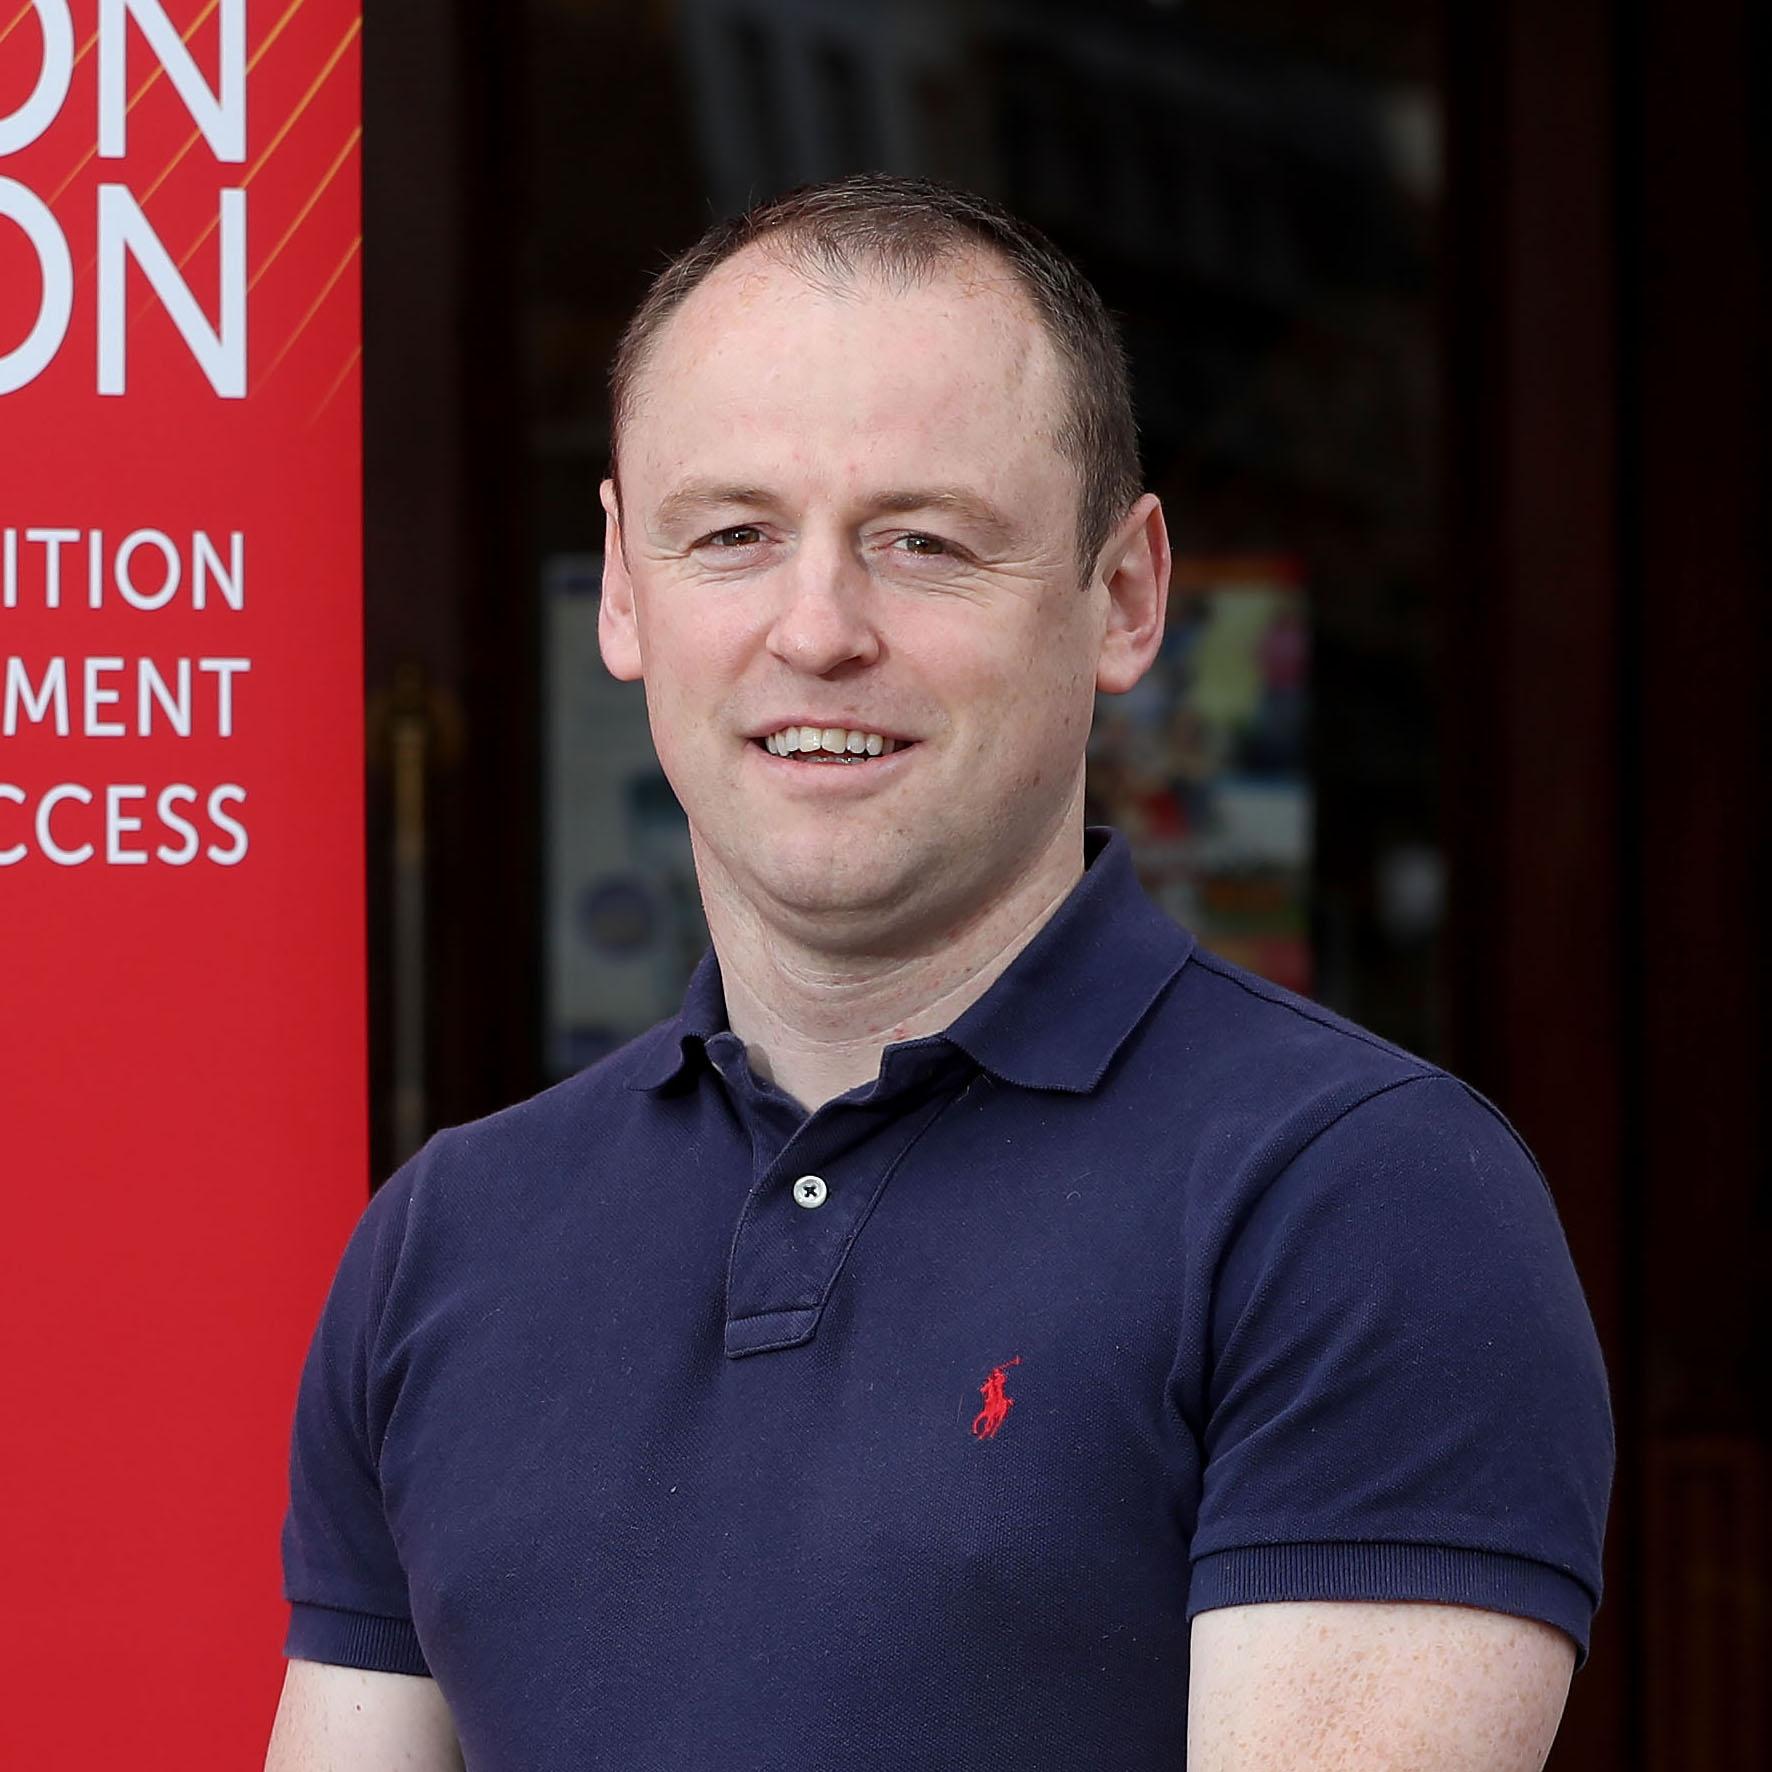 Paul McKernan   STATSports: Managing Director